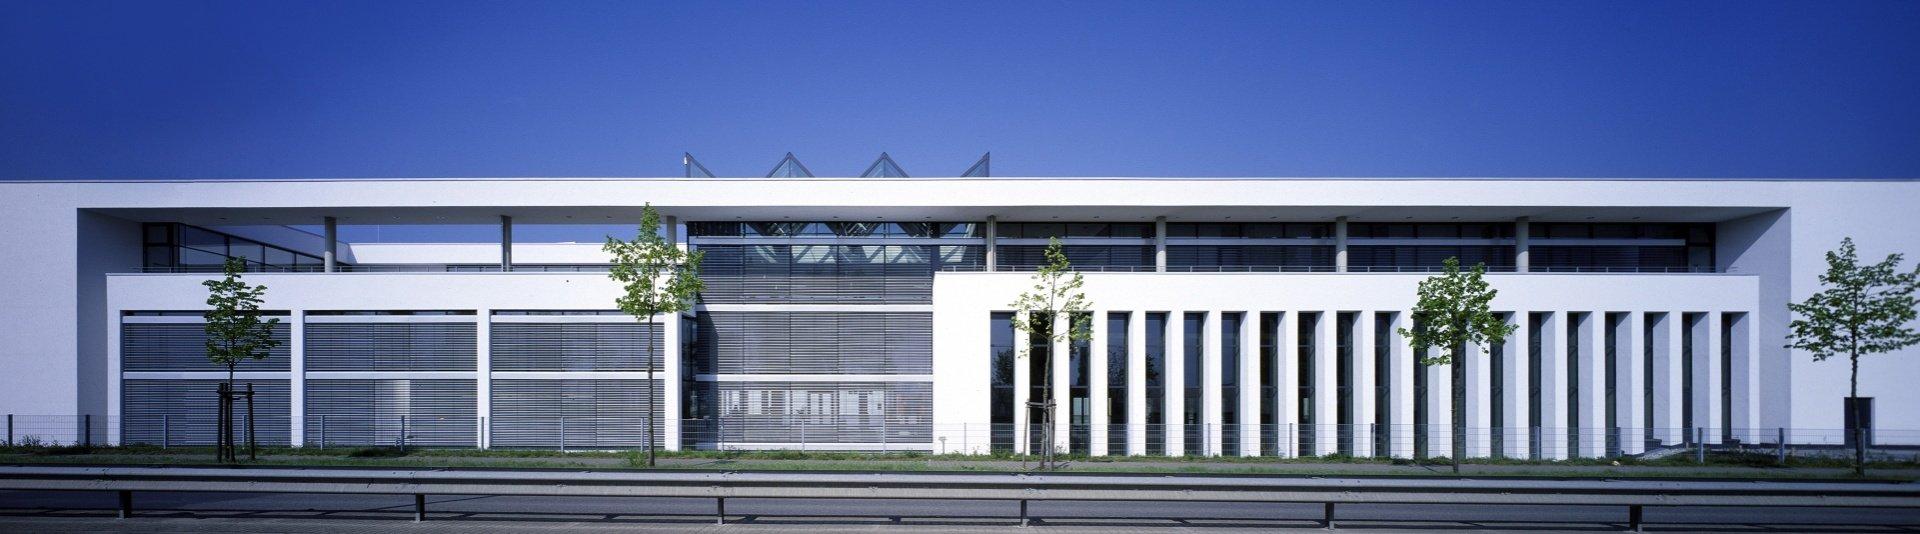 ZFUW - Universität Koblenz-Landau